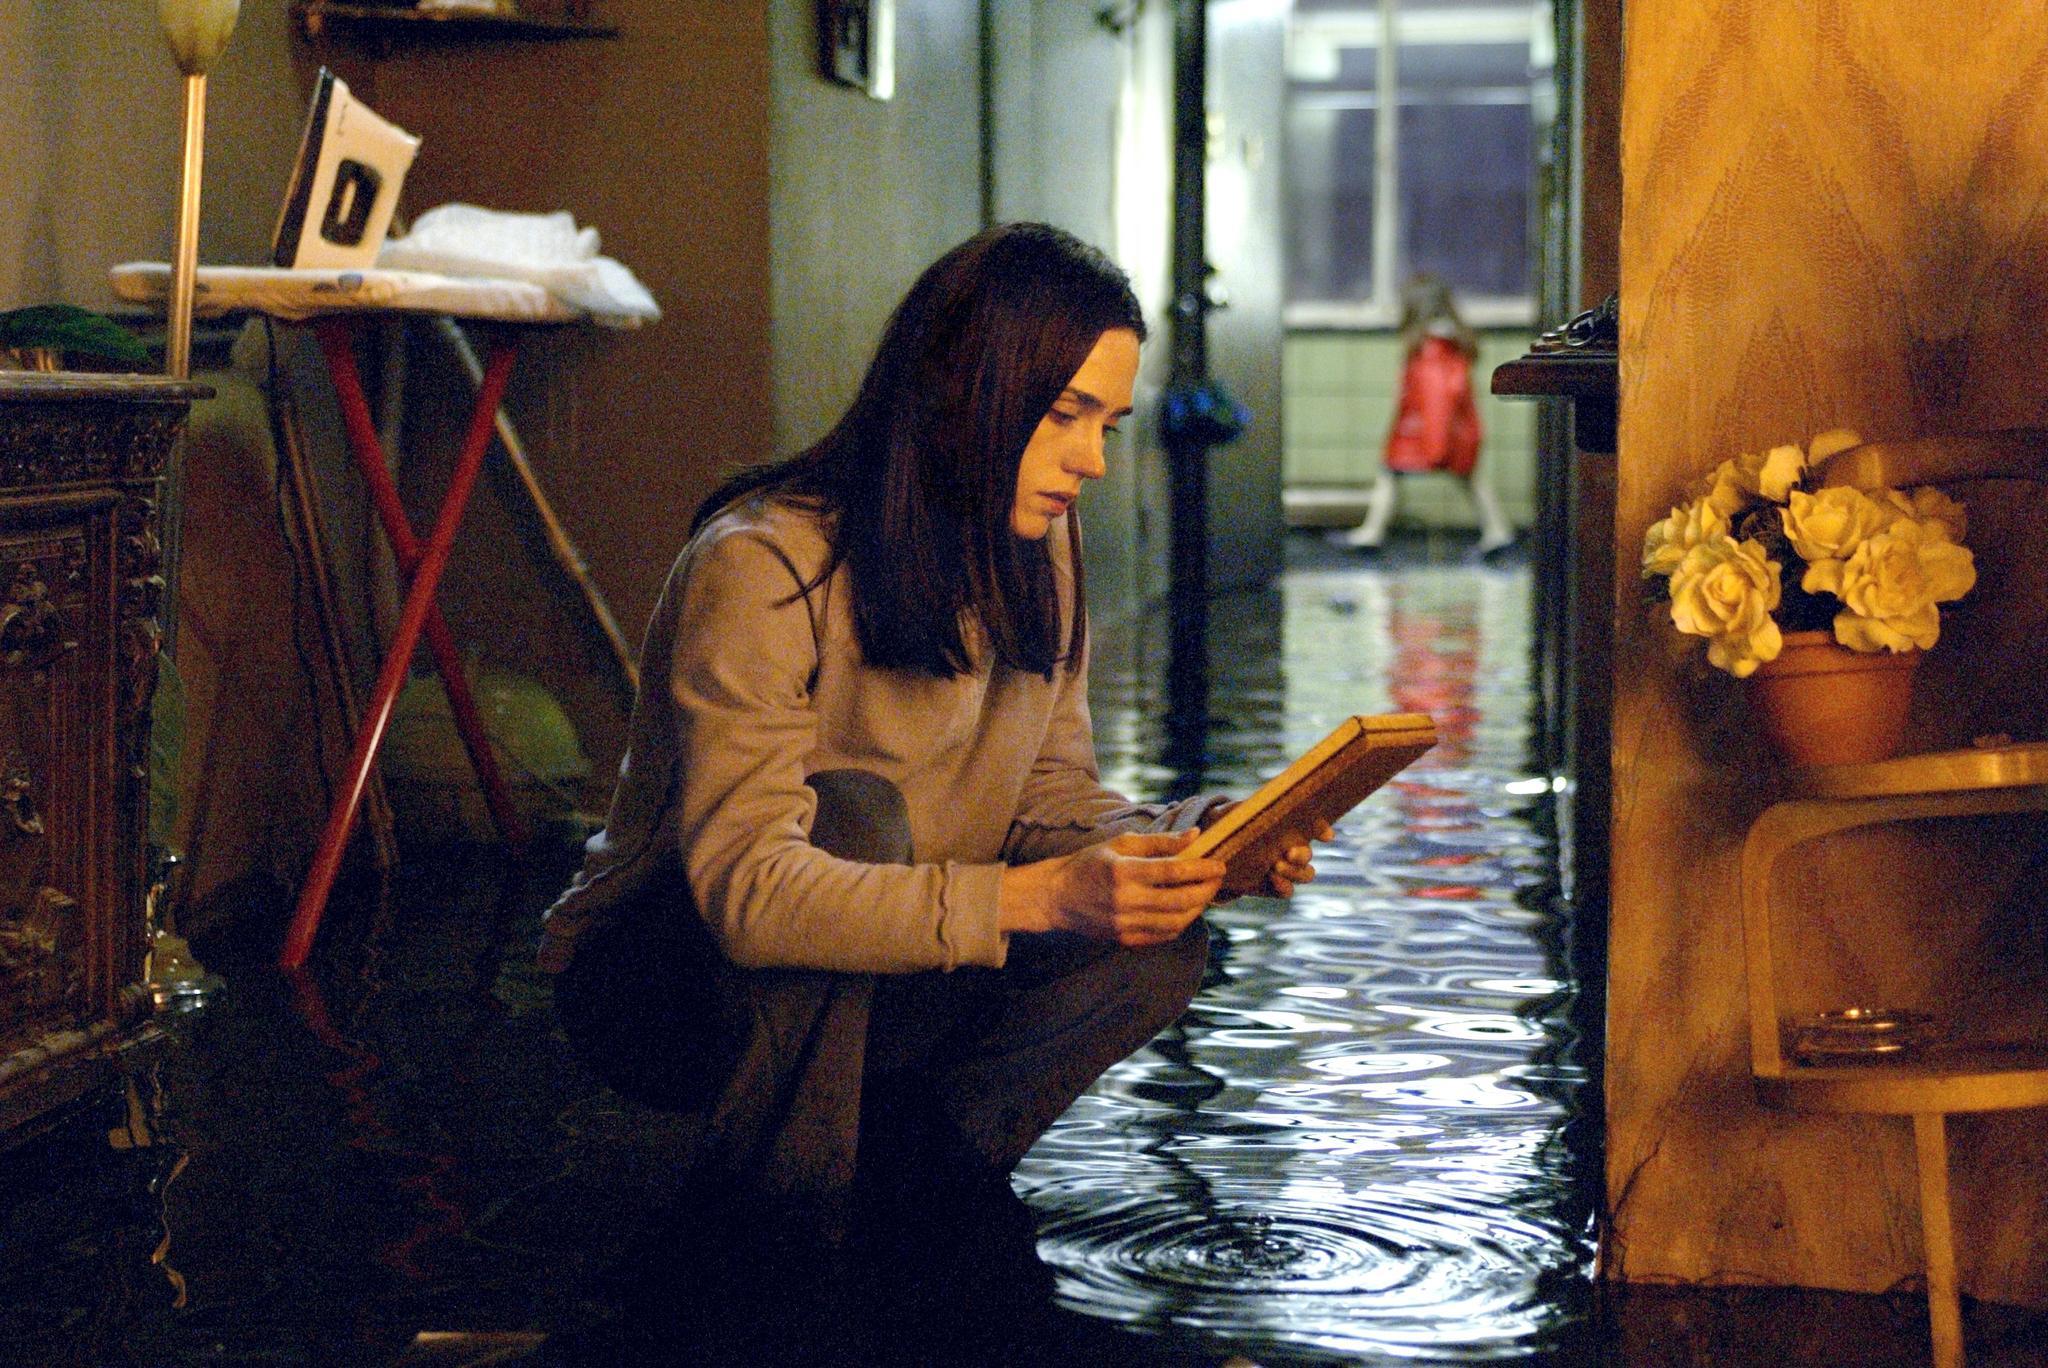 jennifer-connelly-in-dark-water-(2005)